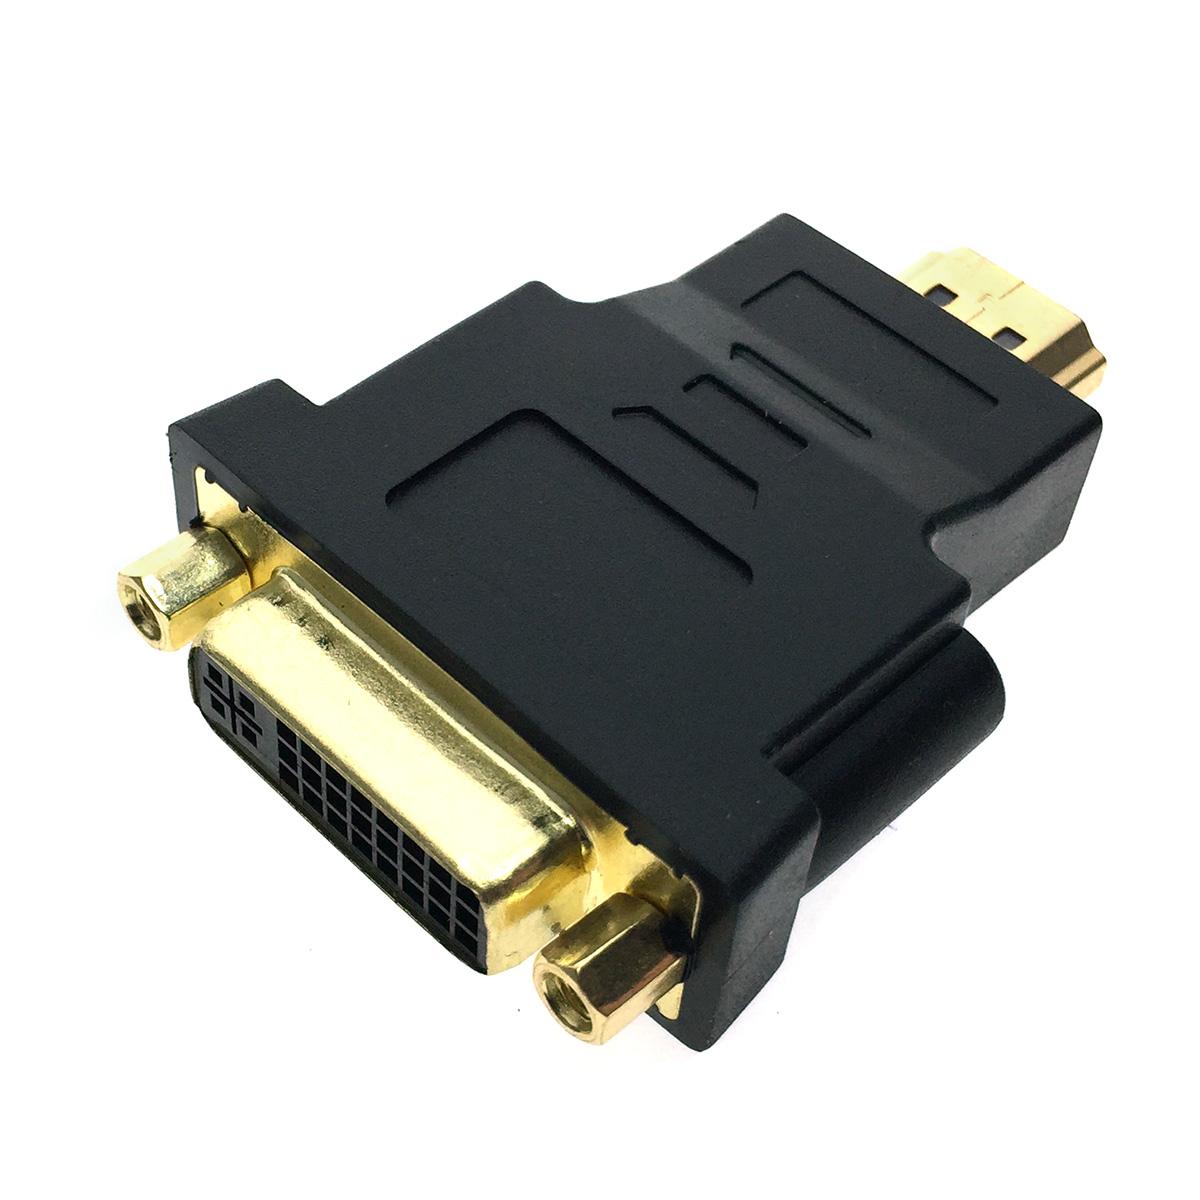 Переходник HDMI 19pin Male to DVI-I 29pin Female ESPADA модель: EHDMI19m-DVI29f